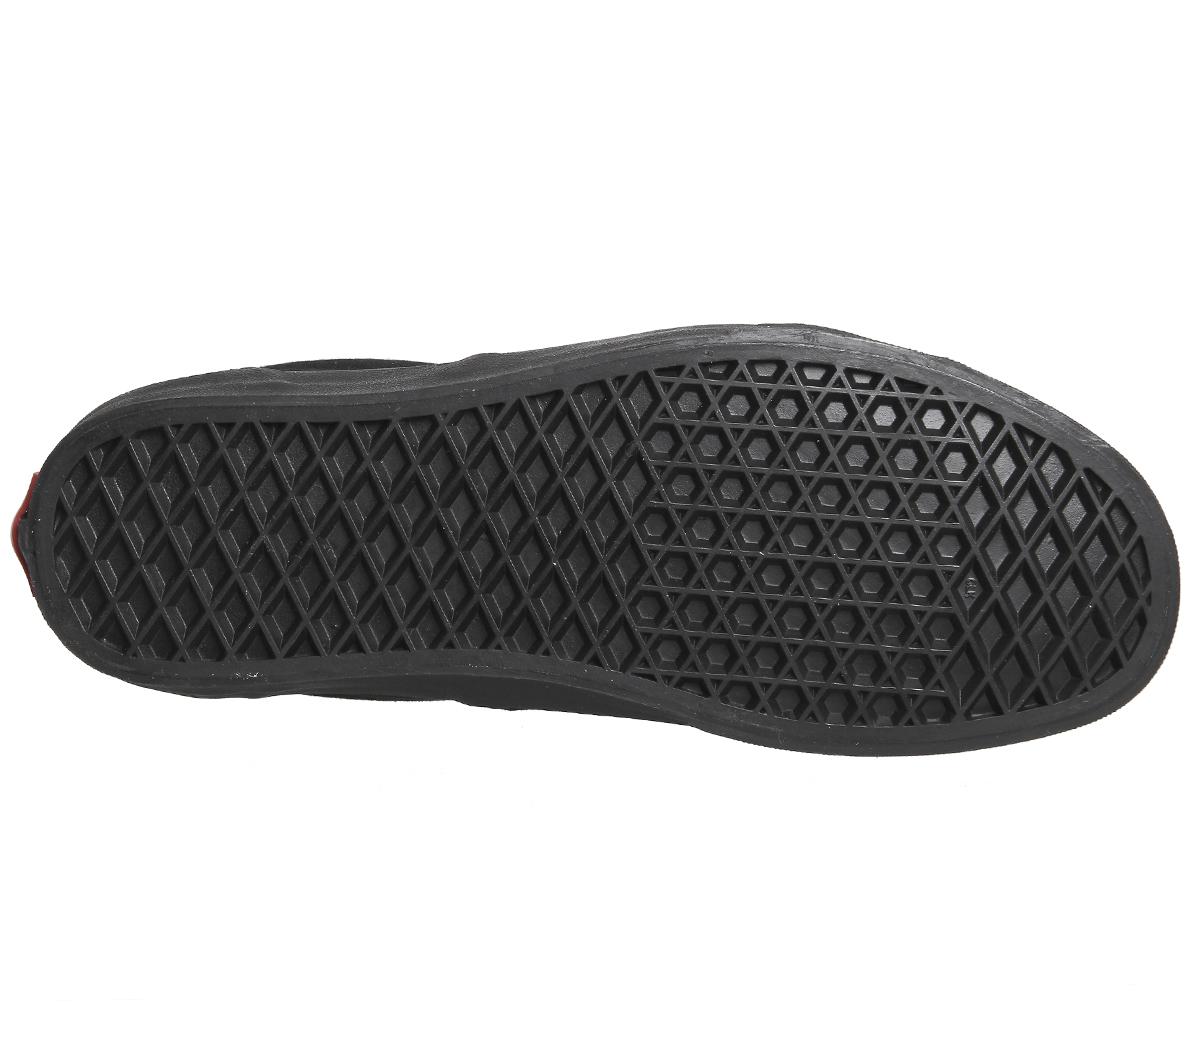 Mens Vans Era Trainers BLACK MONO Trainers Schuhes